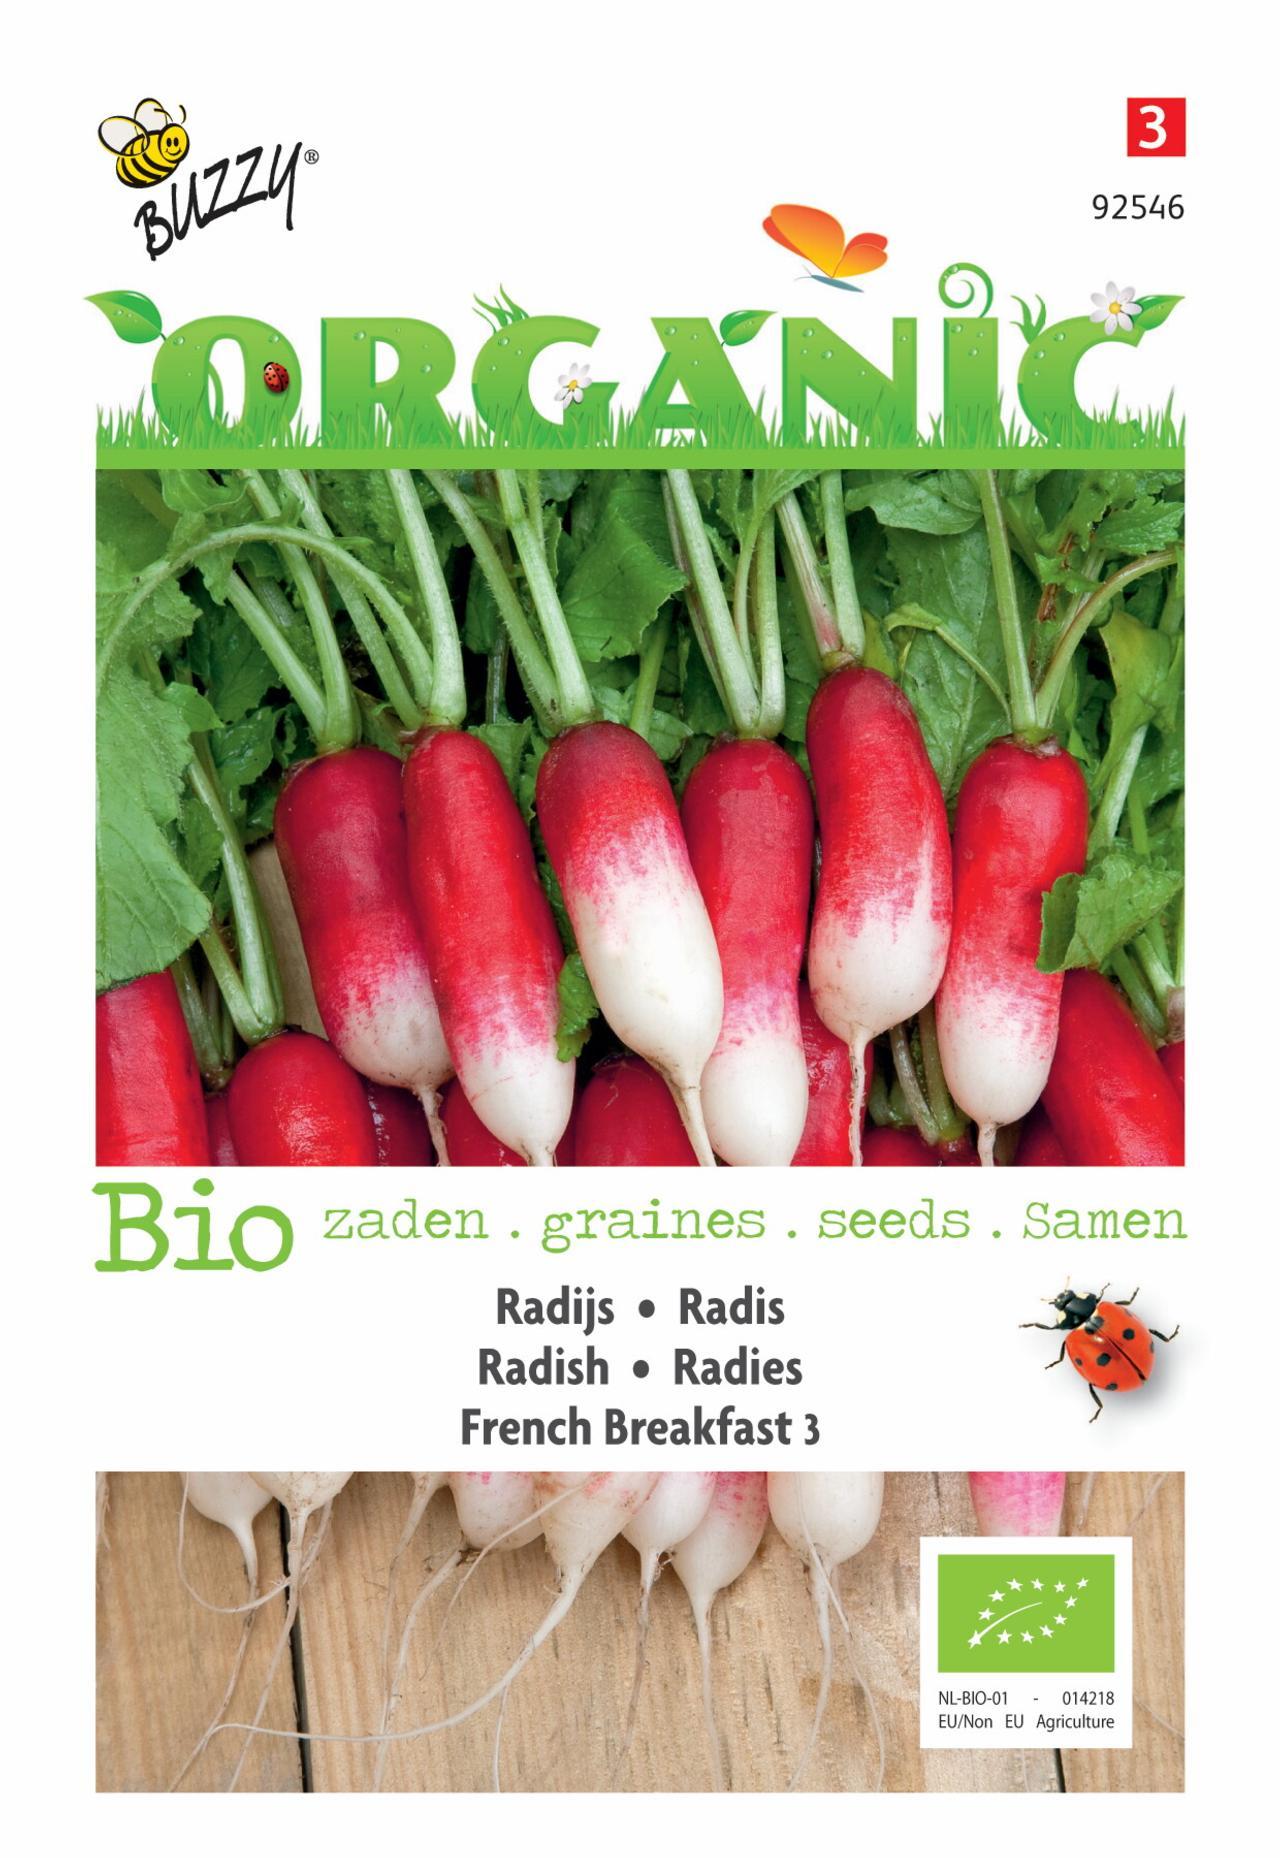 Raphanus sativus 'French Breakfast 3' (BIO) plant